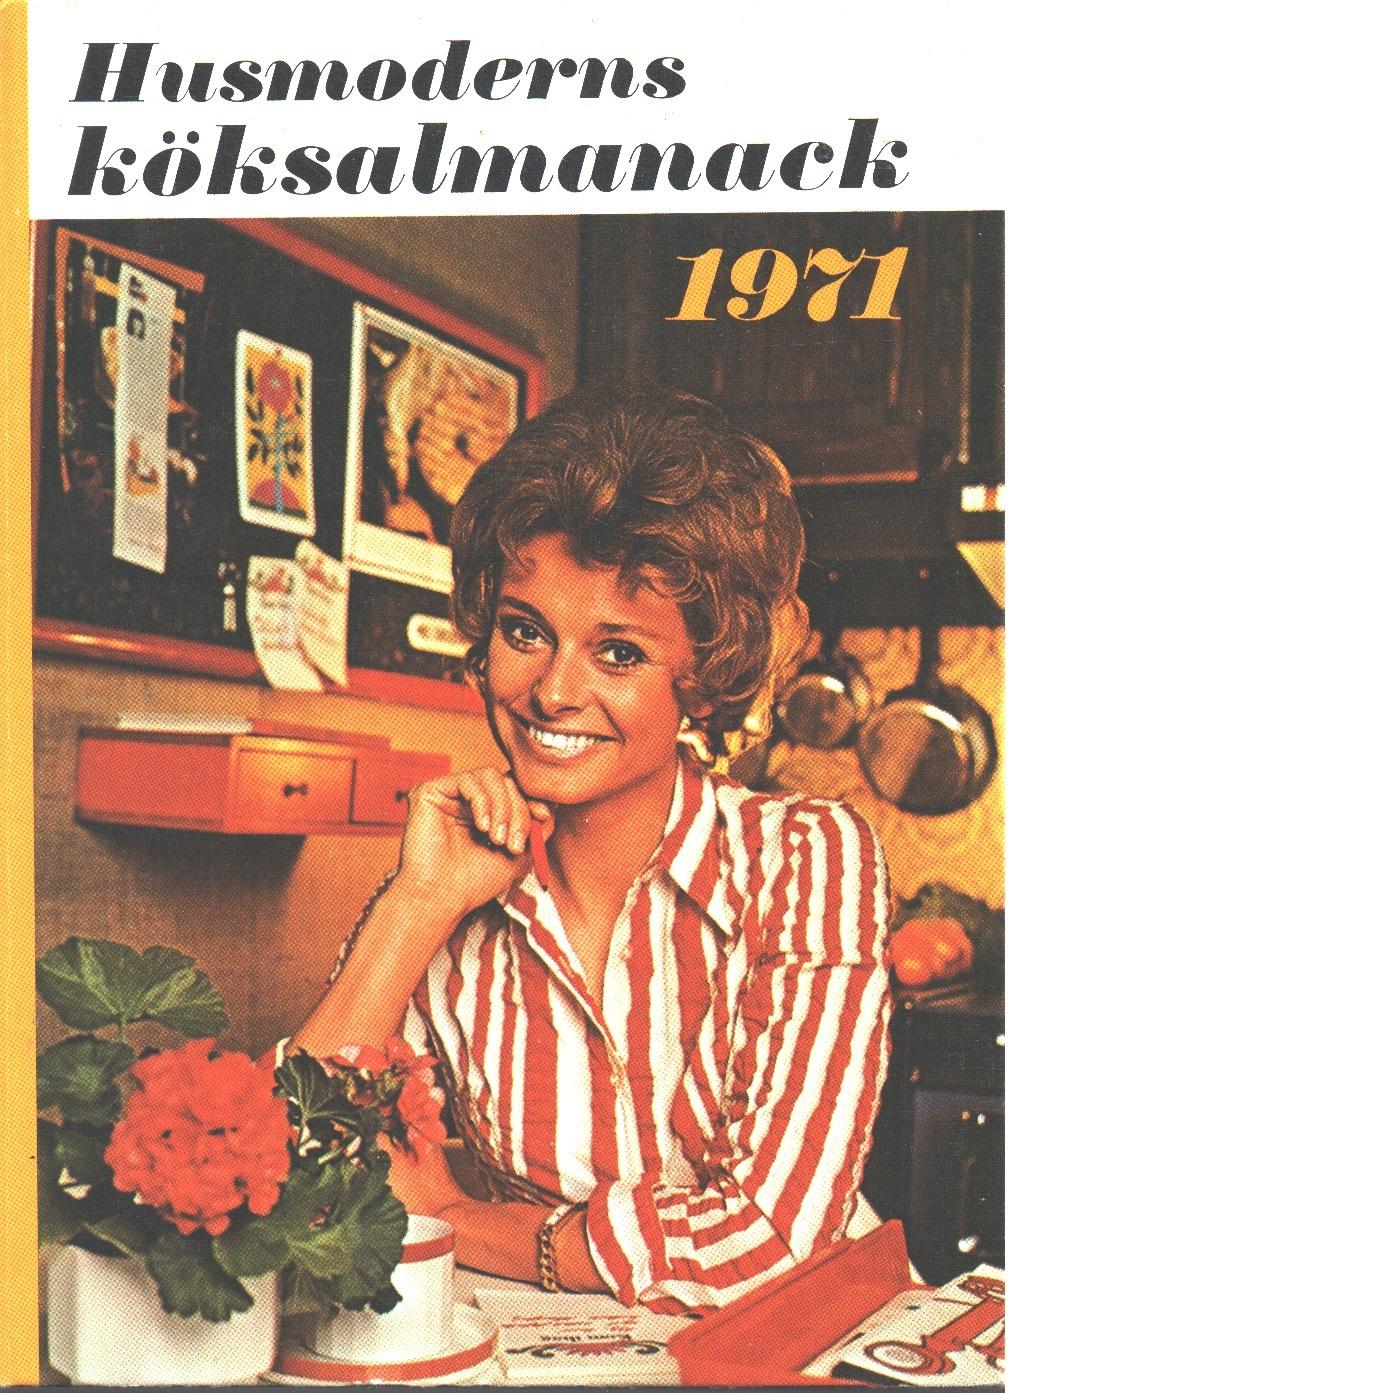 Köksalmanack 1971 - Red.